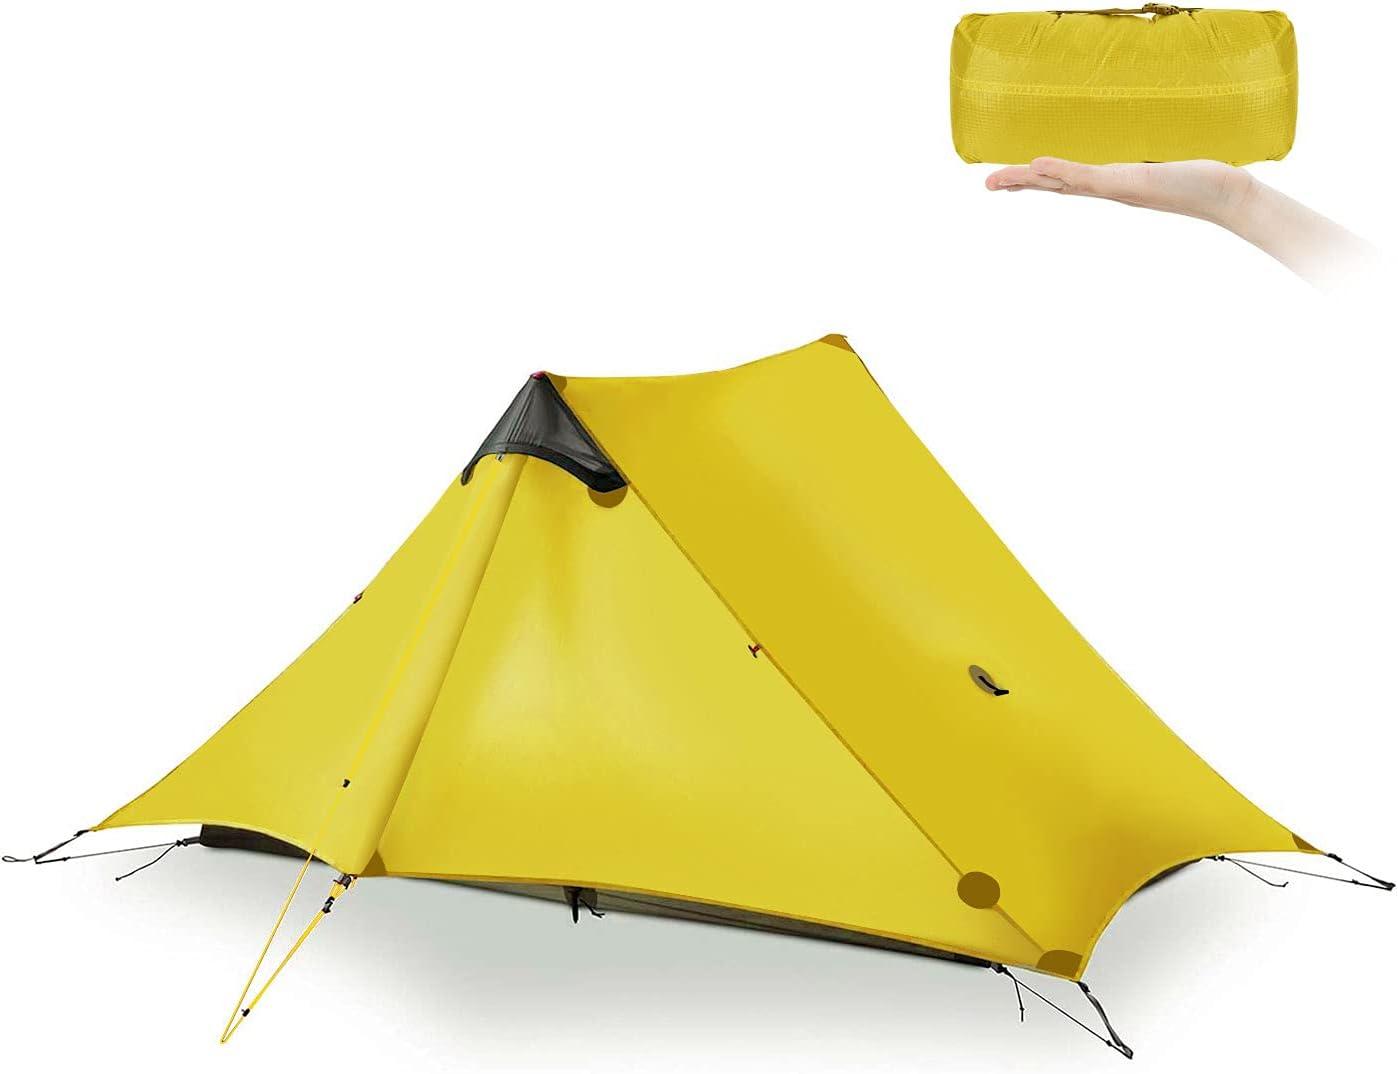 Ultralight Tent 3-Season Backpacking Tent 1 Person/2 Person Camping Tent, Outdoor Lightweight LanShan Camping Tent Shelter, Perfect for Camping, Trekking, Kayaking, Climbing, Hiking